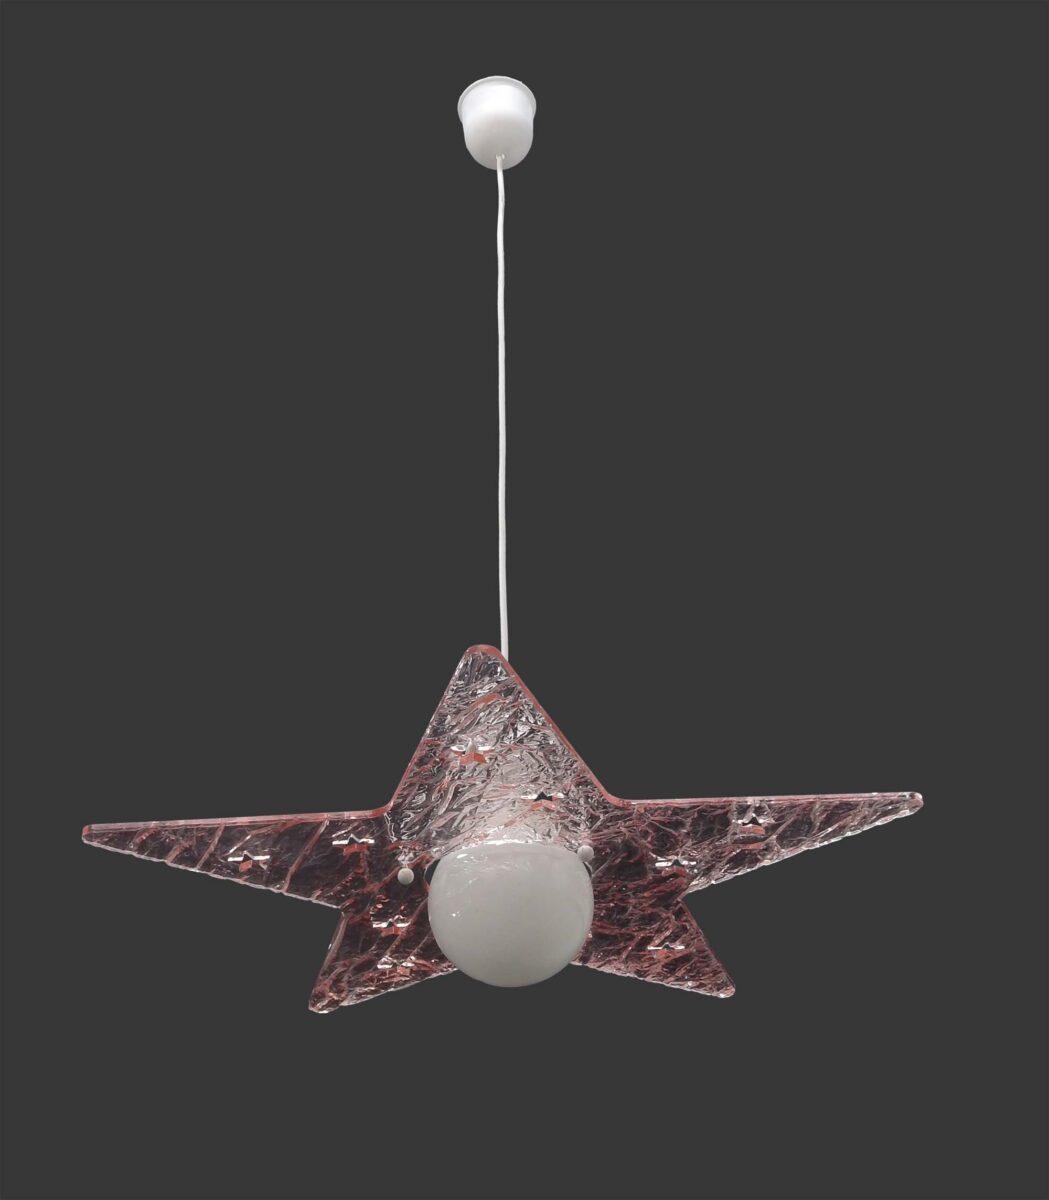 Lampadario sospensione stella plexiglass ghiaccio rosa for Lampadario led leroy merlin